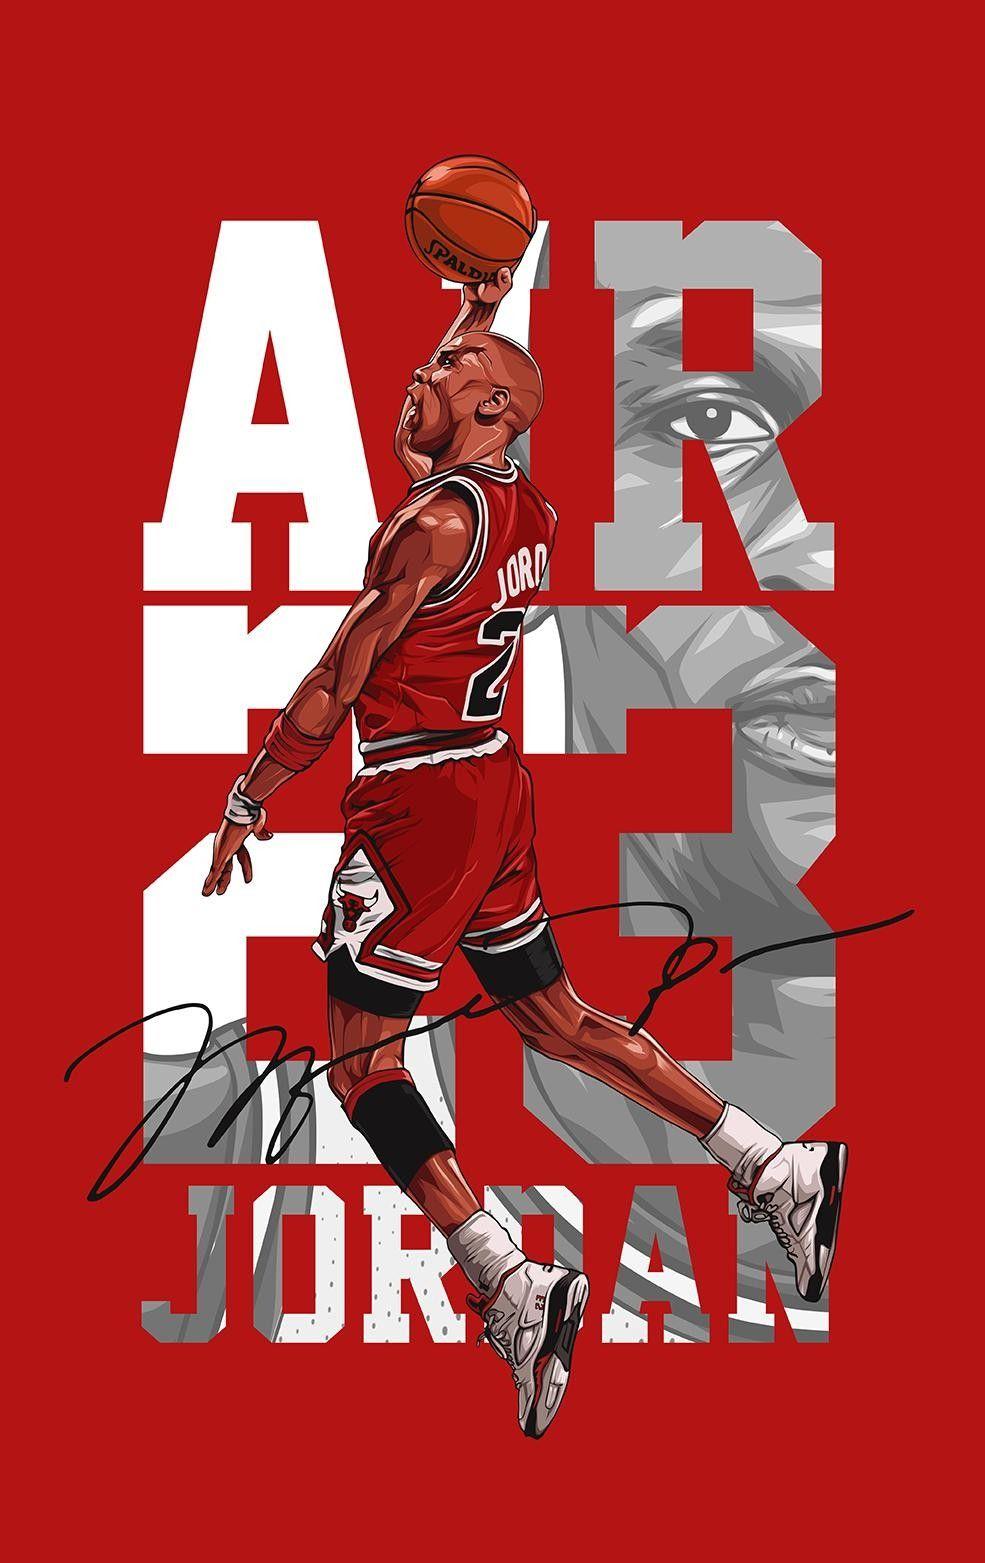 Pin By Pepito Baldemoro On спорт Michael Jordan Art Jordan Logo Wallpaper Michael Jordan Basketball